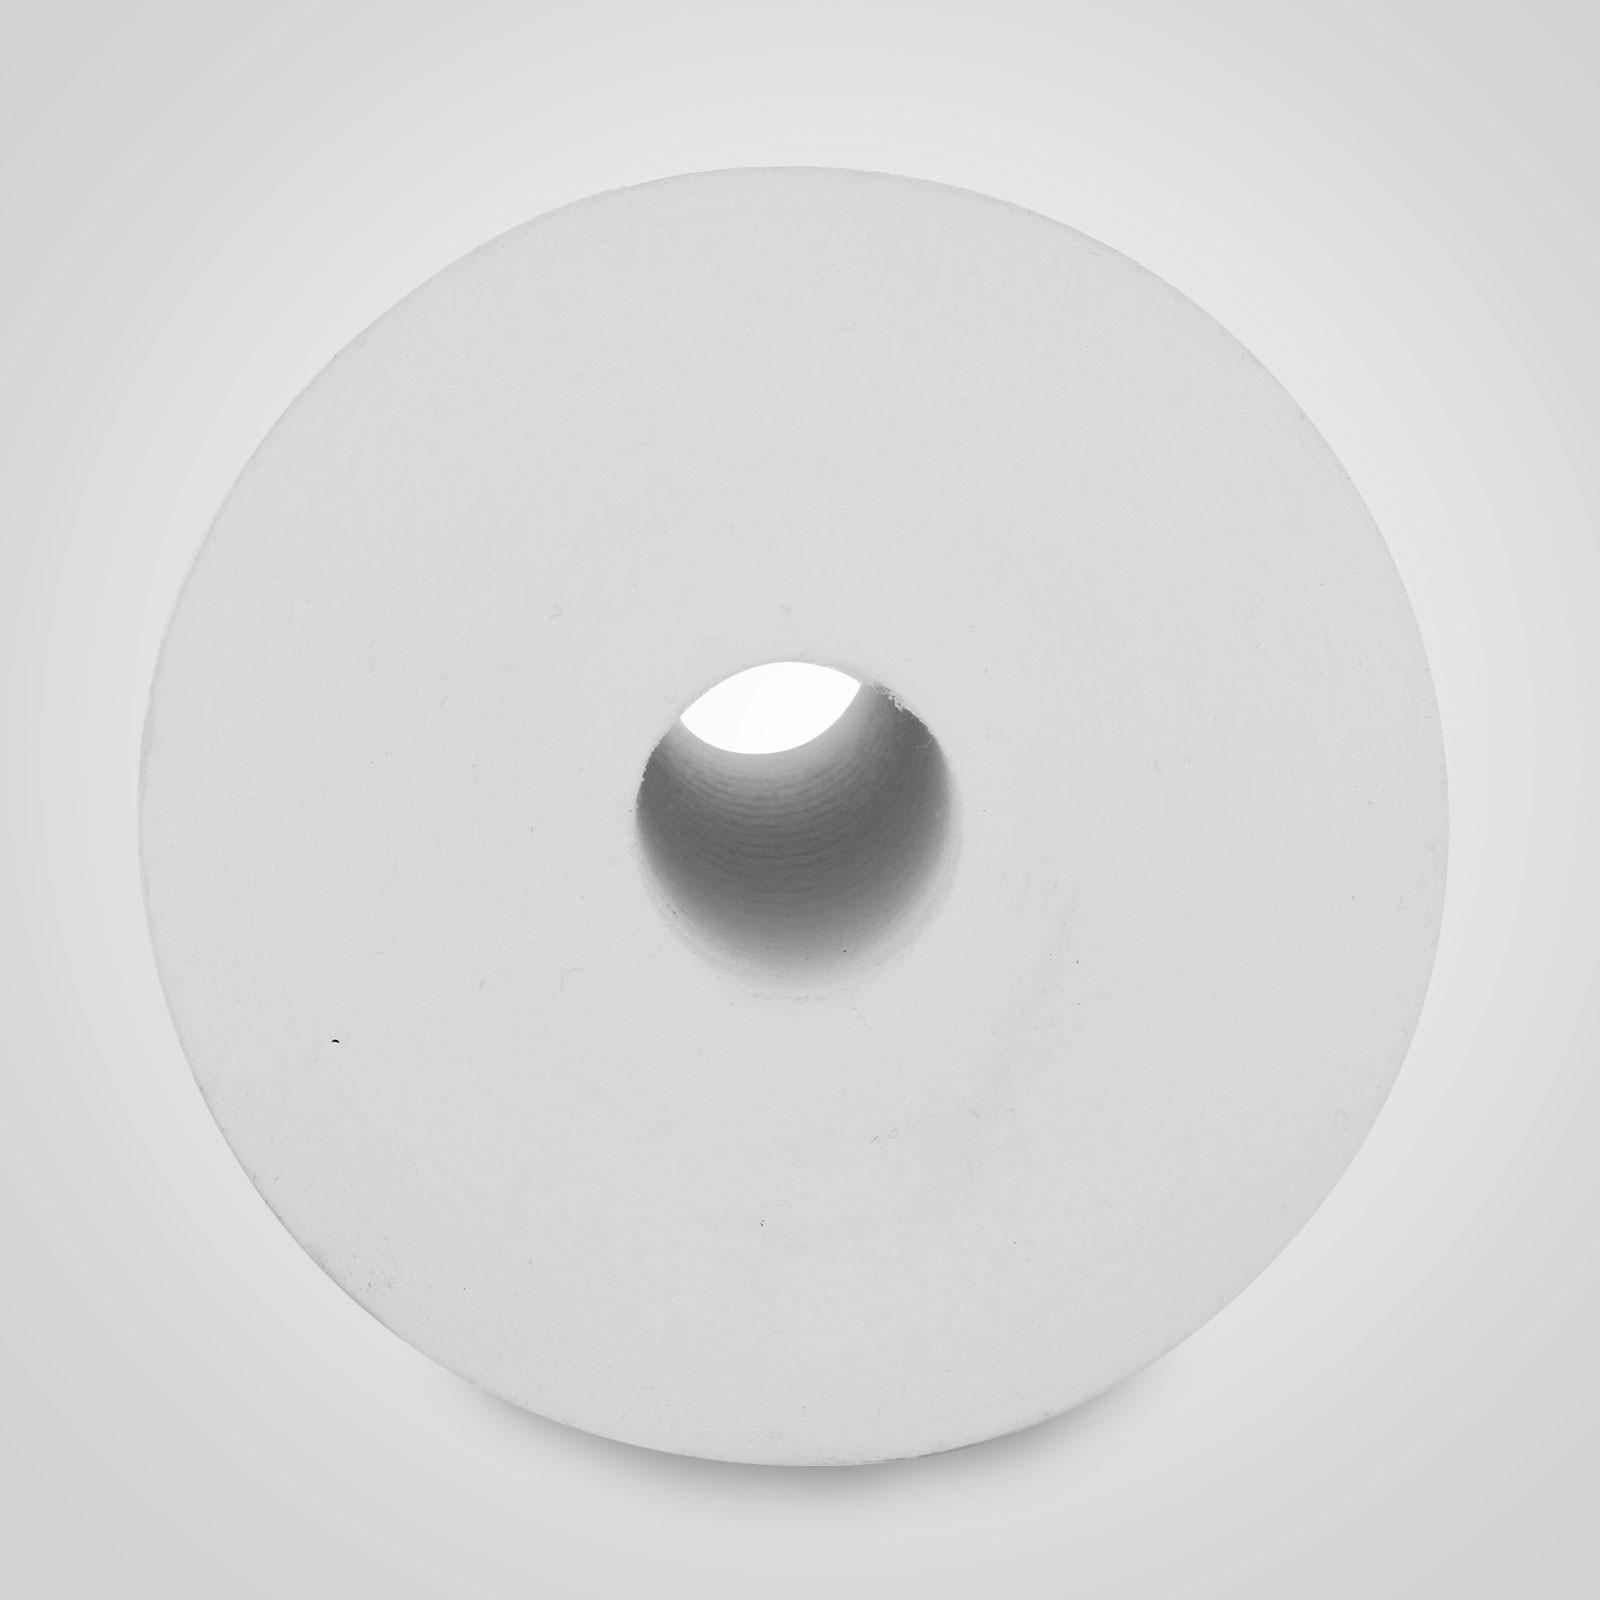 20Pcs-Cartouche-Filtre-a-eau-5-Micron-10-034-X-4-5-034-as-Brita-Bobine-Anti-boue miniature 4